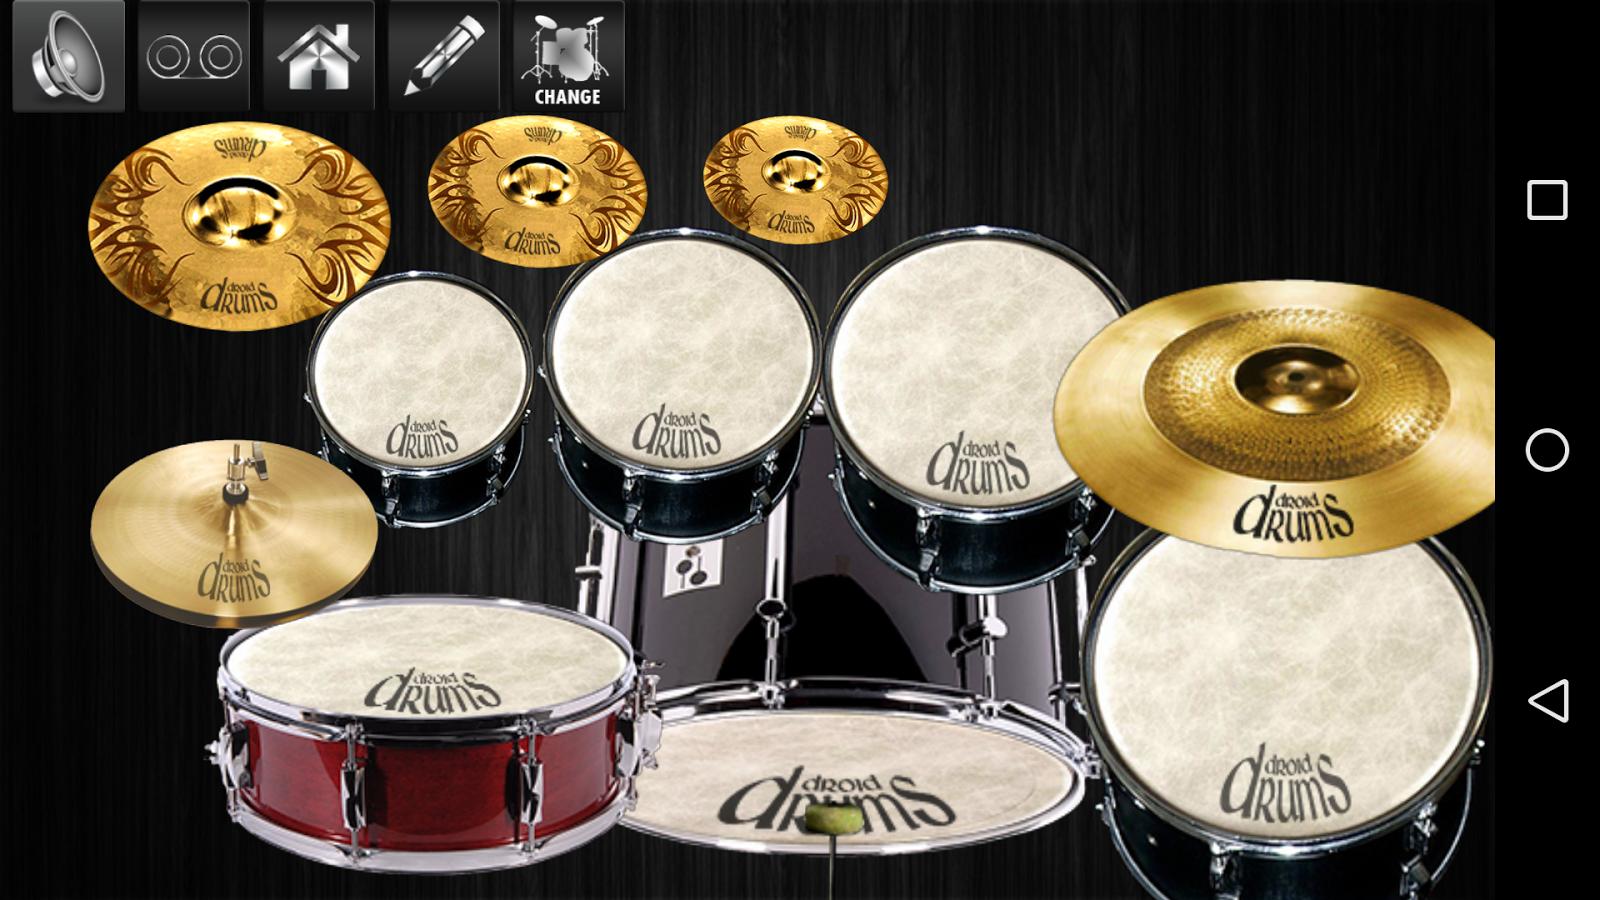 Download Drum Live Real drum set drum kit music drum beat APK Android